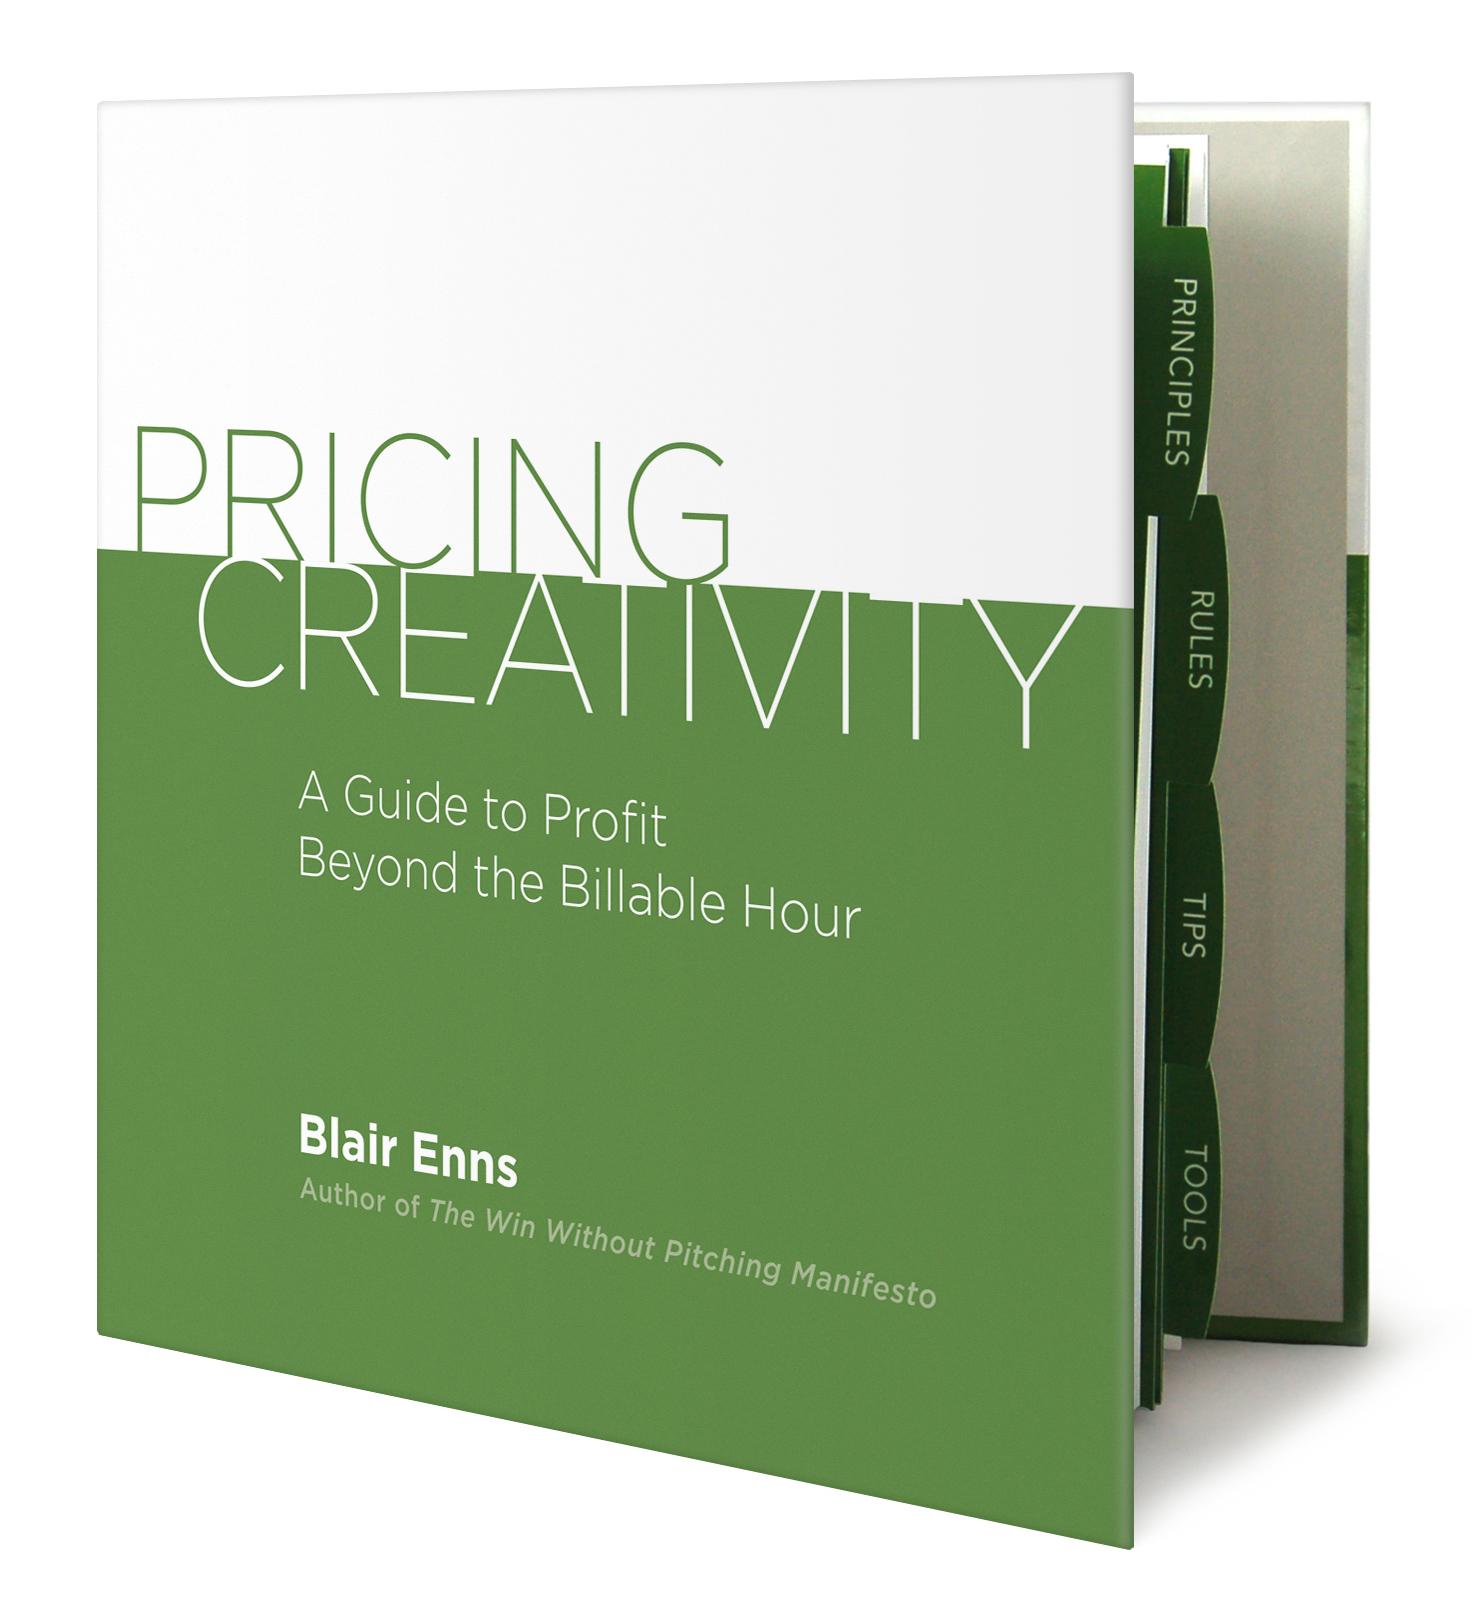 Pricing-Creativity.jpg